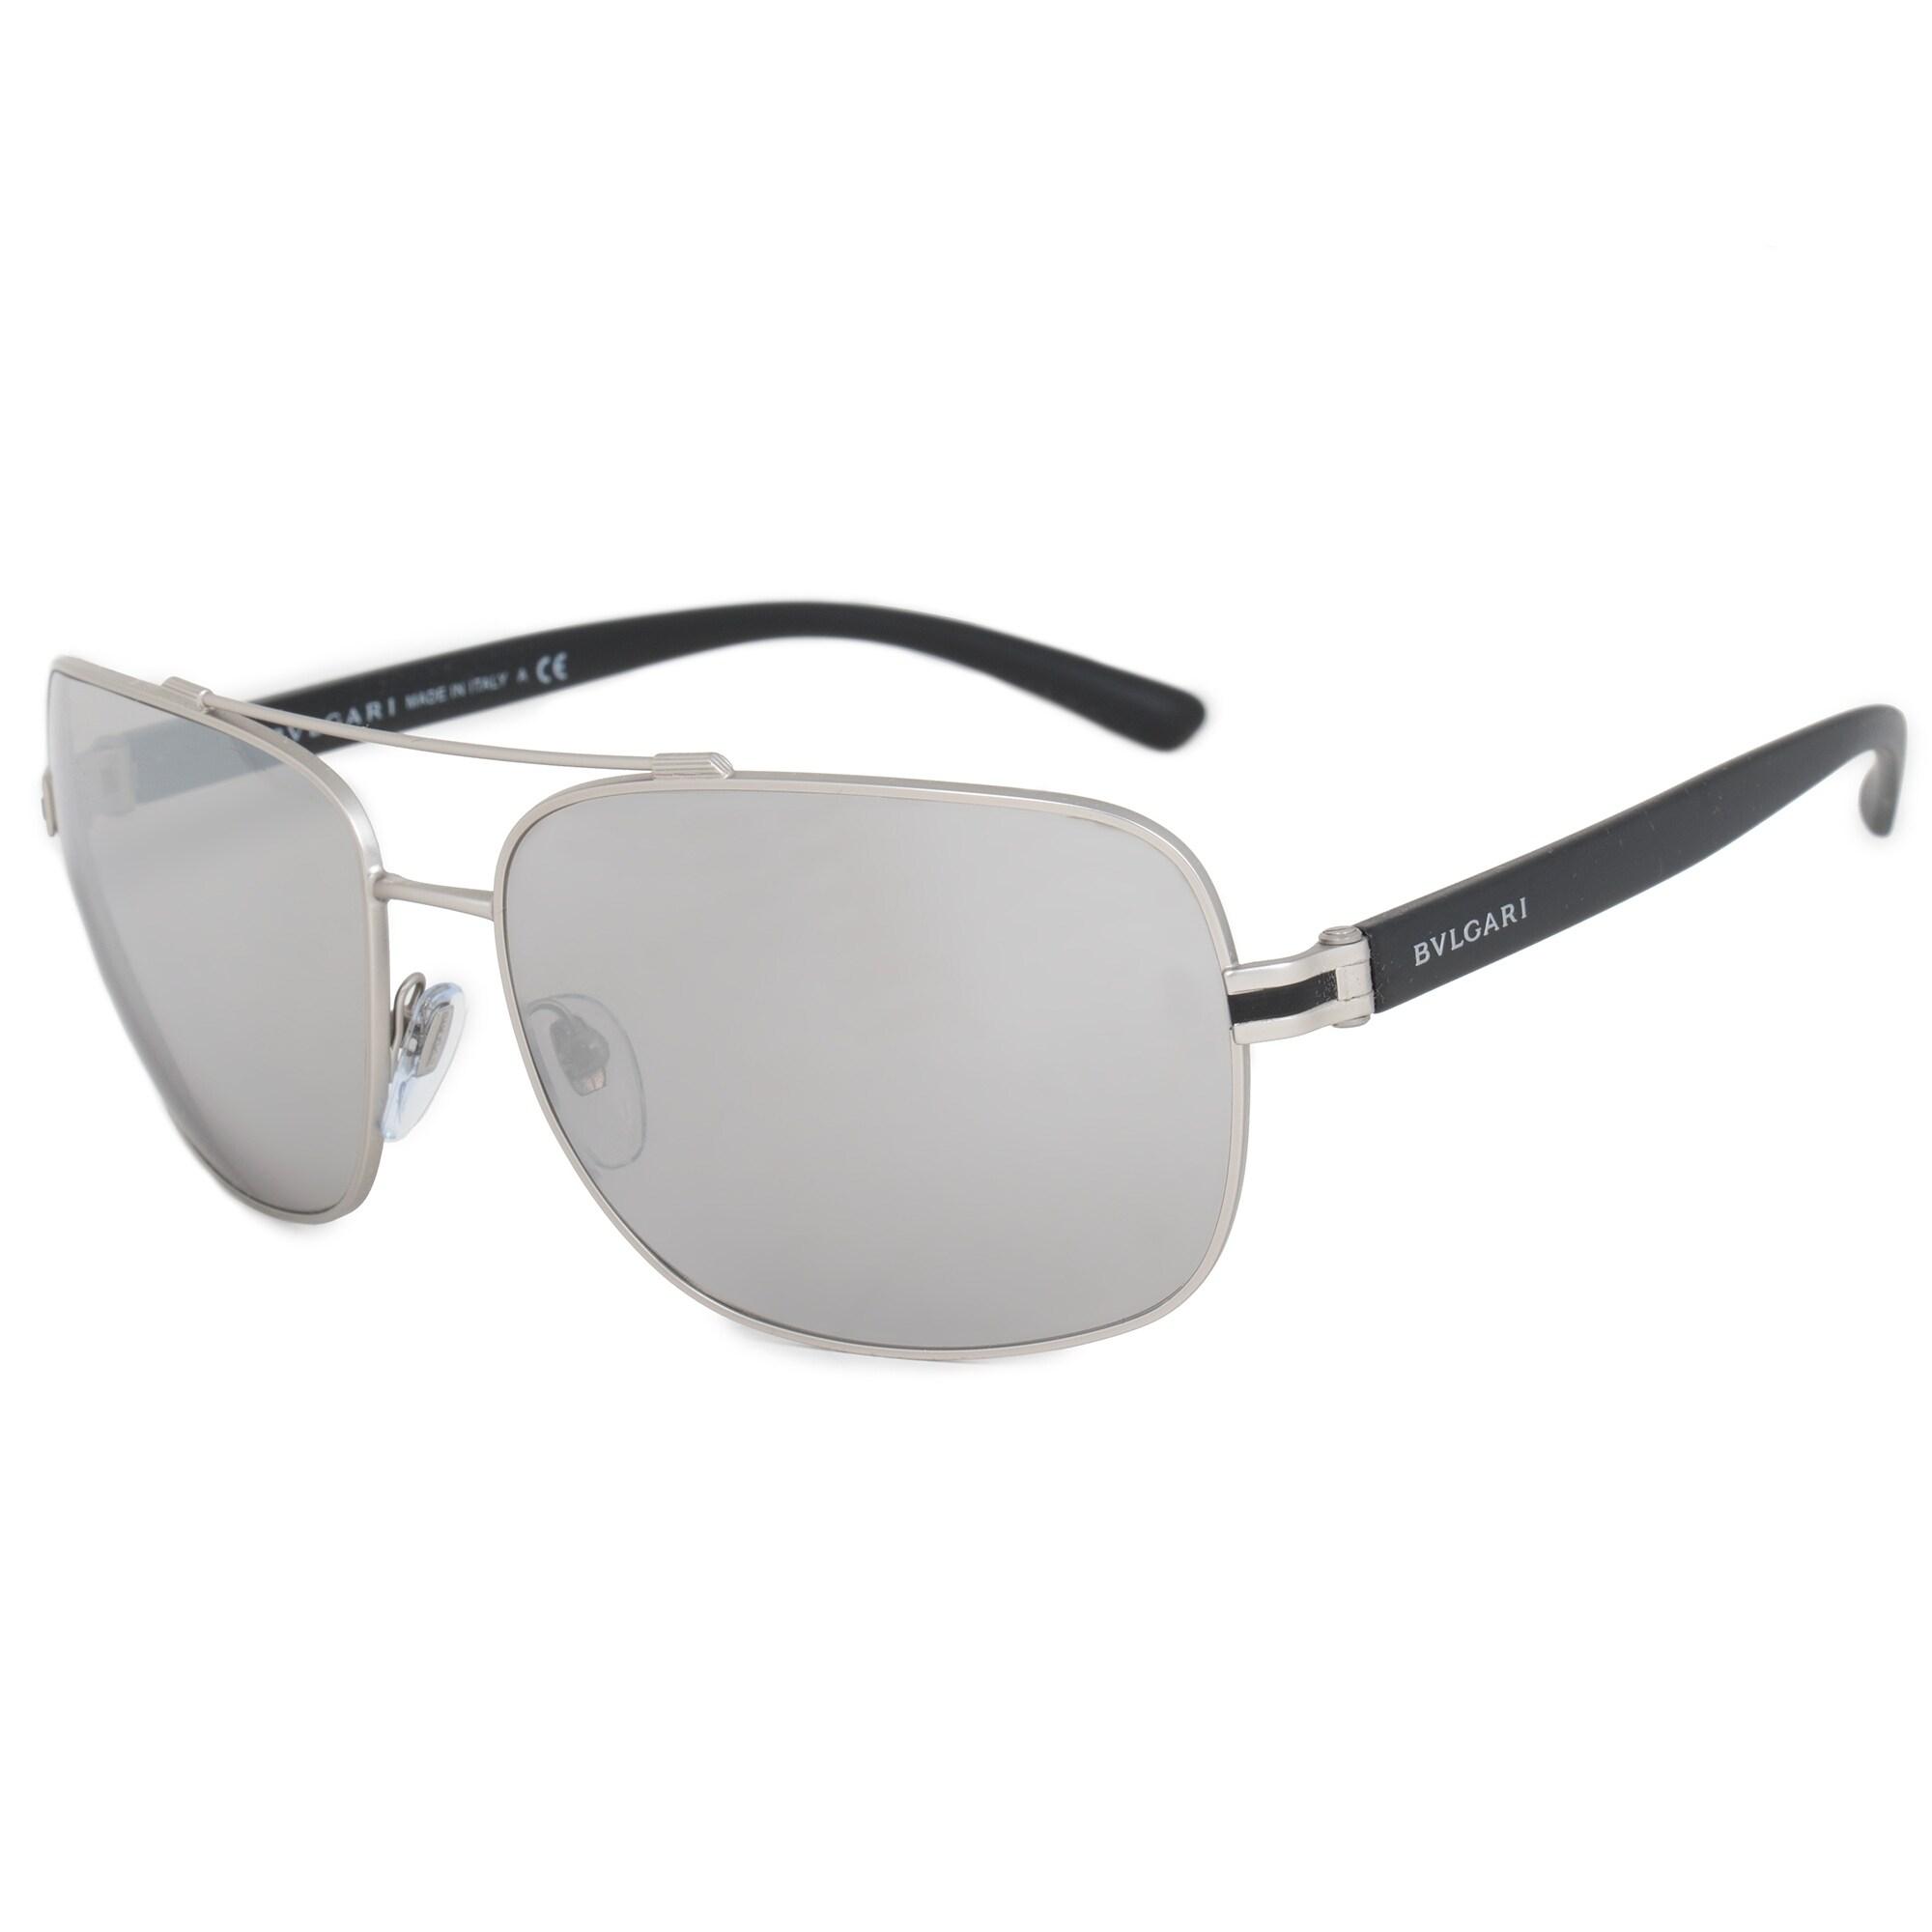 7d801e1bcaf Shop Bvlgari Aviator Sunglasses BV5038 400 6G 63 - Ships To Canada -  Overstock - 21408903